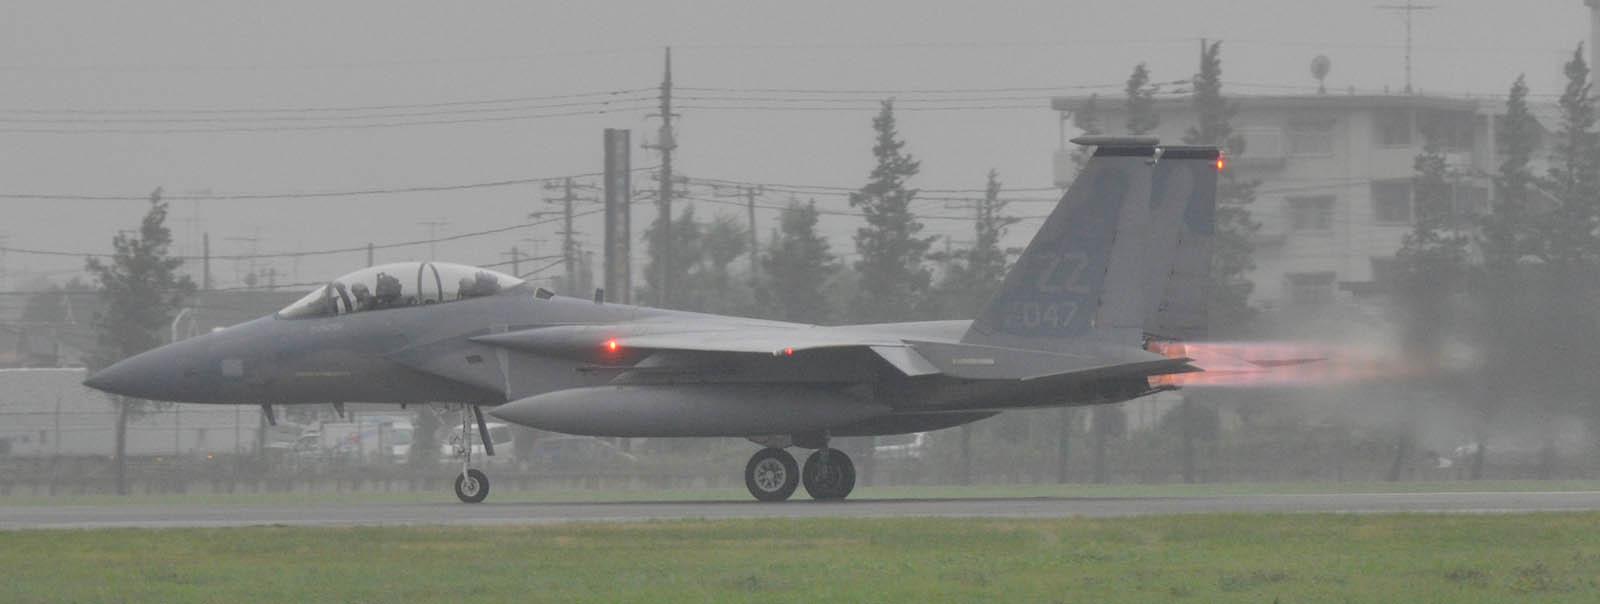 F15d120720g016